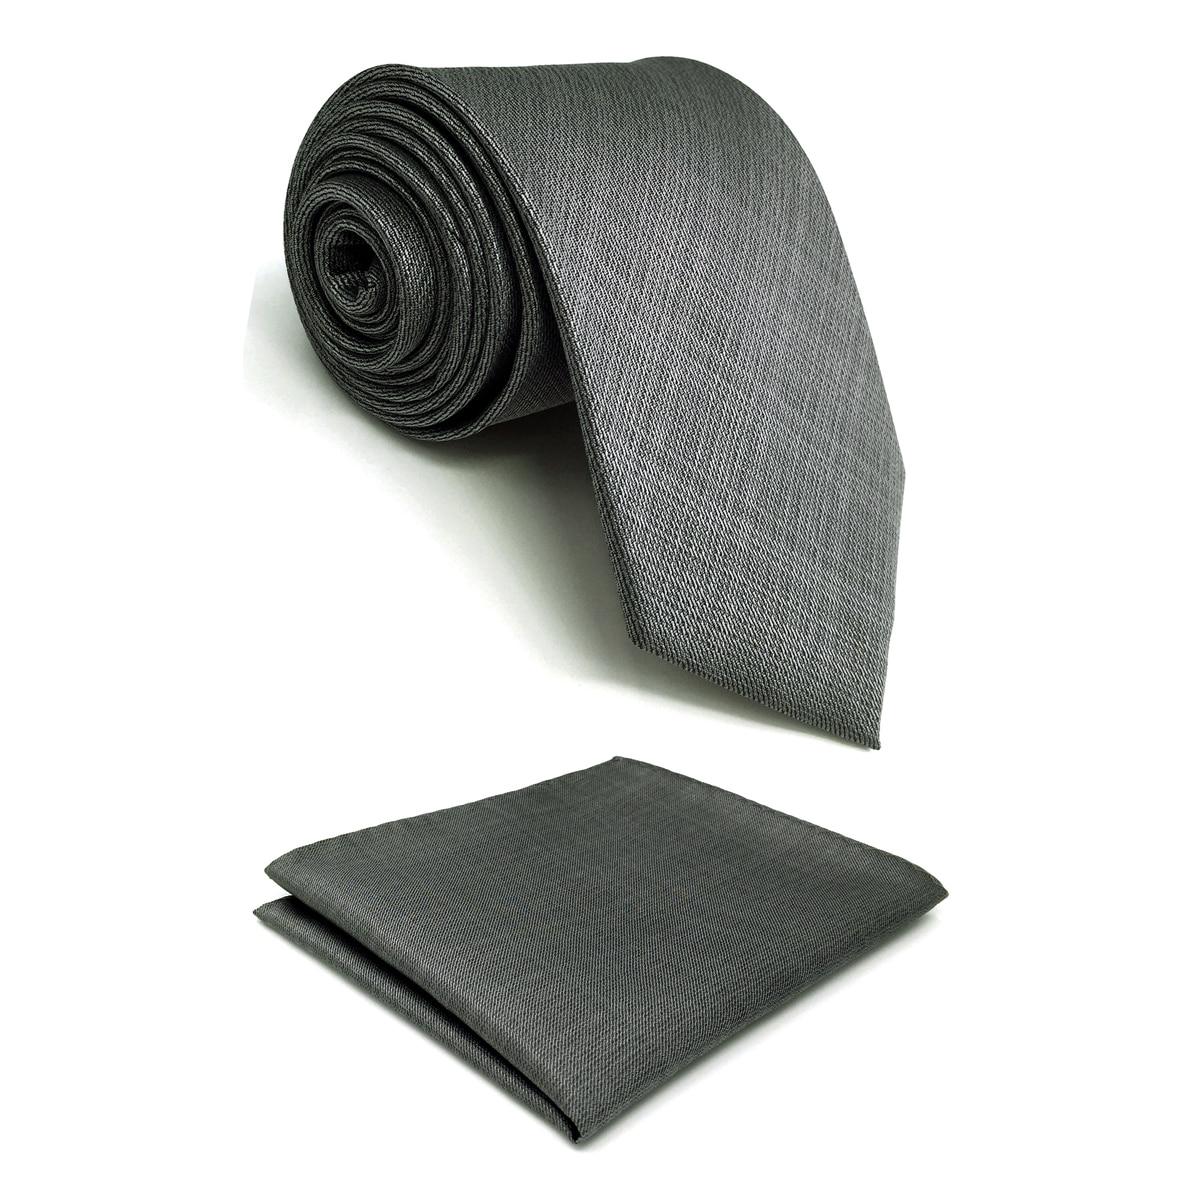 C20 Solid Gray Ties For Men Tie Set Silk Extra Long Silk Slim Skinny Classic